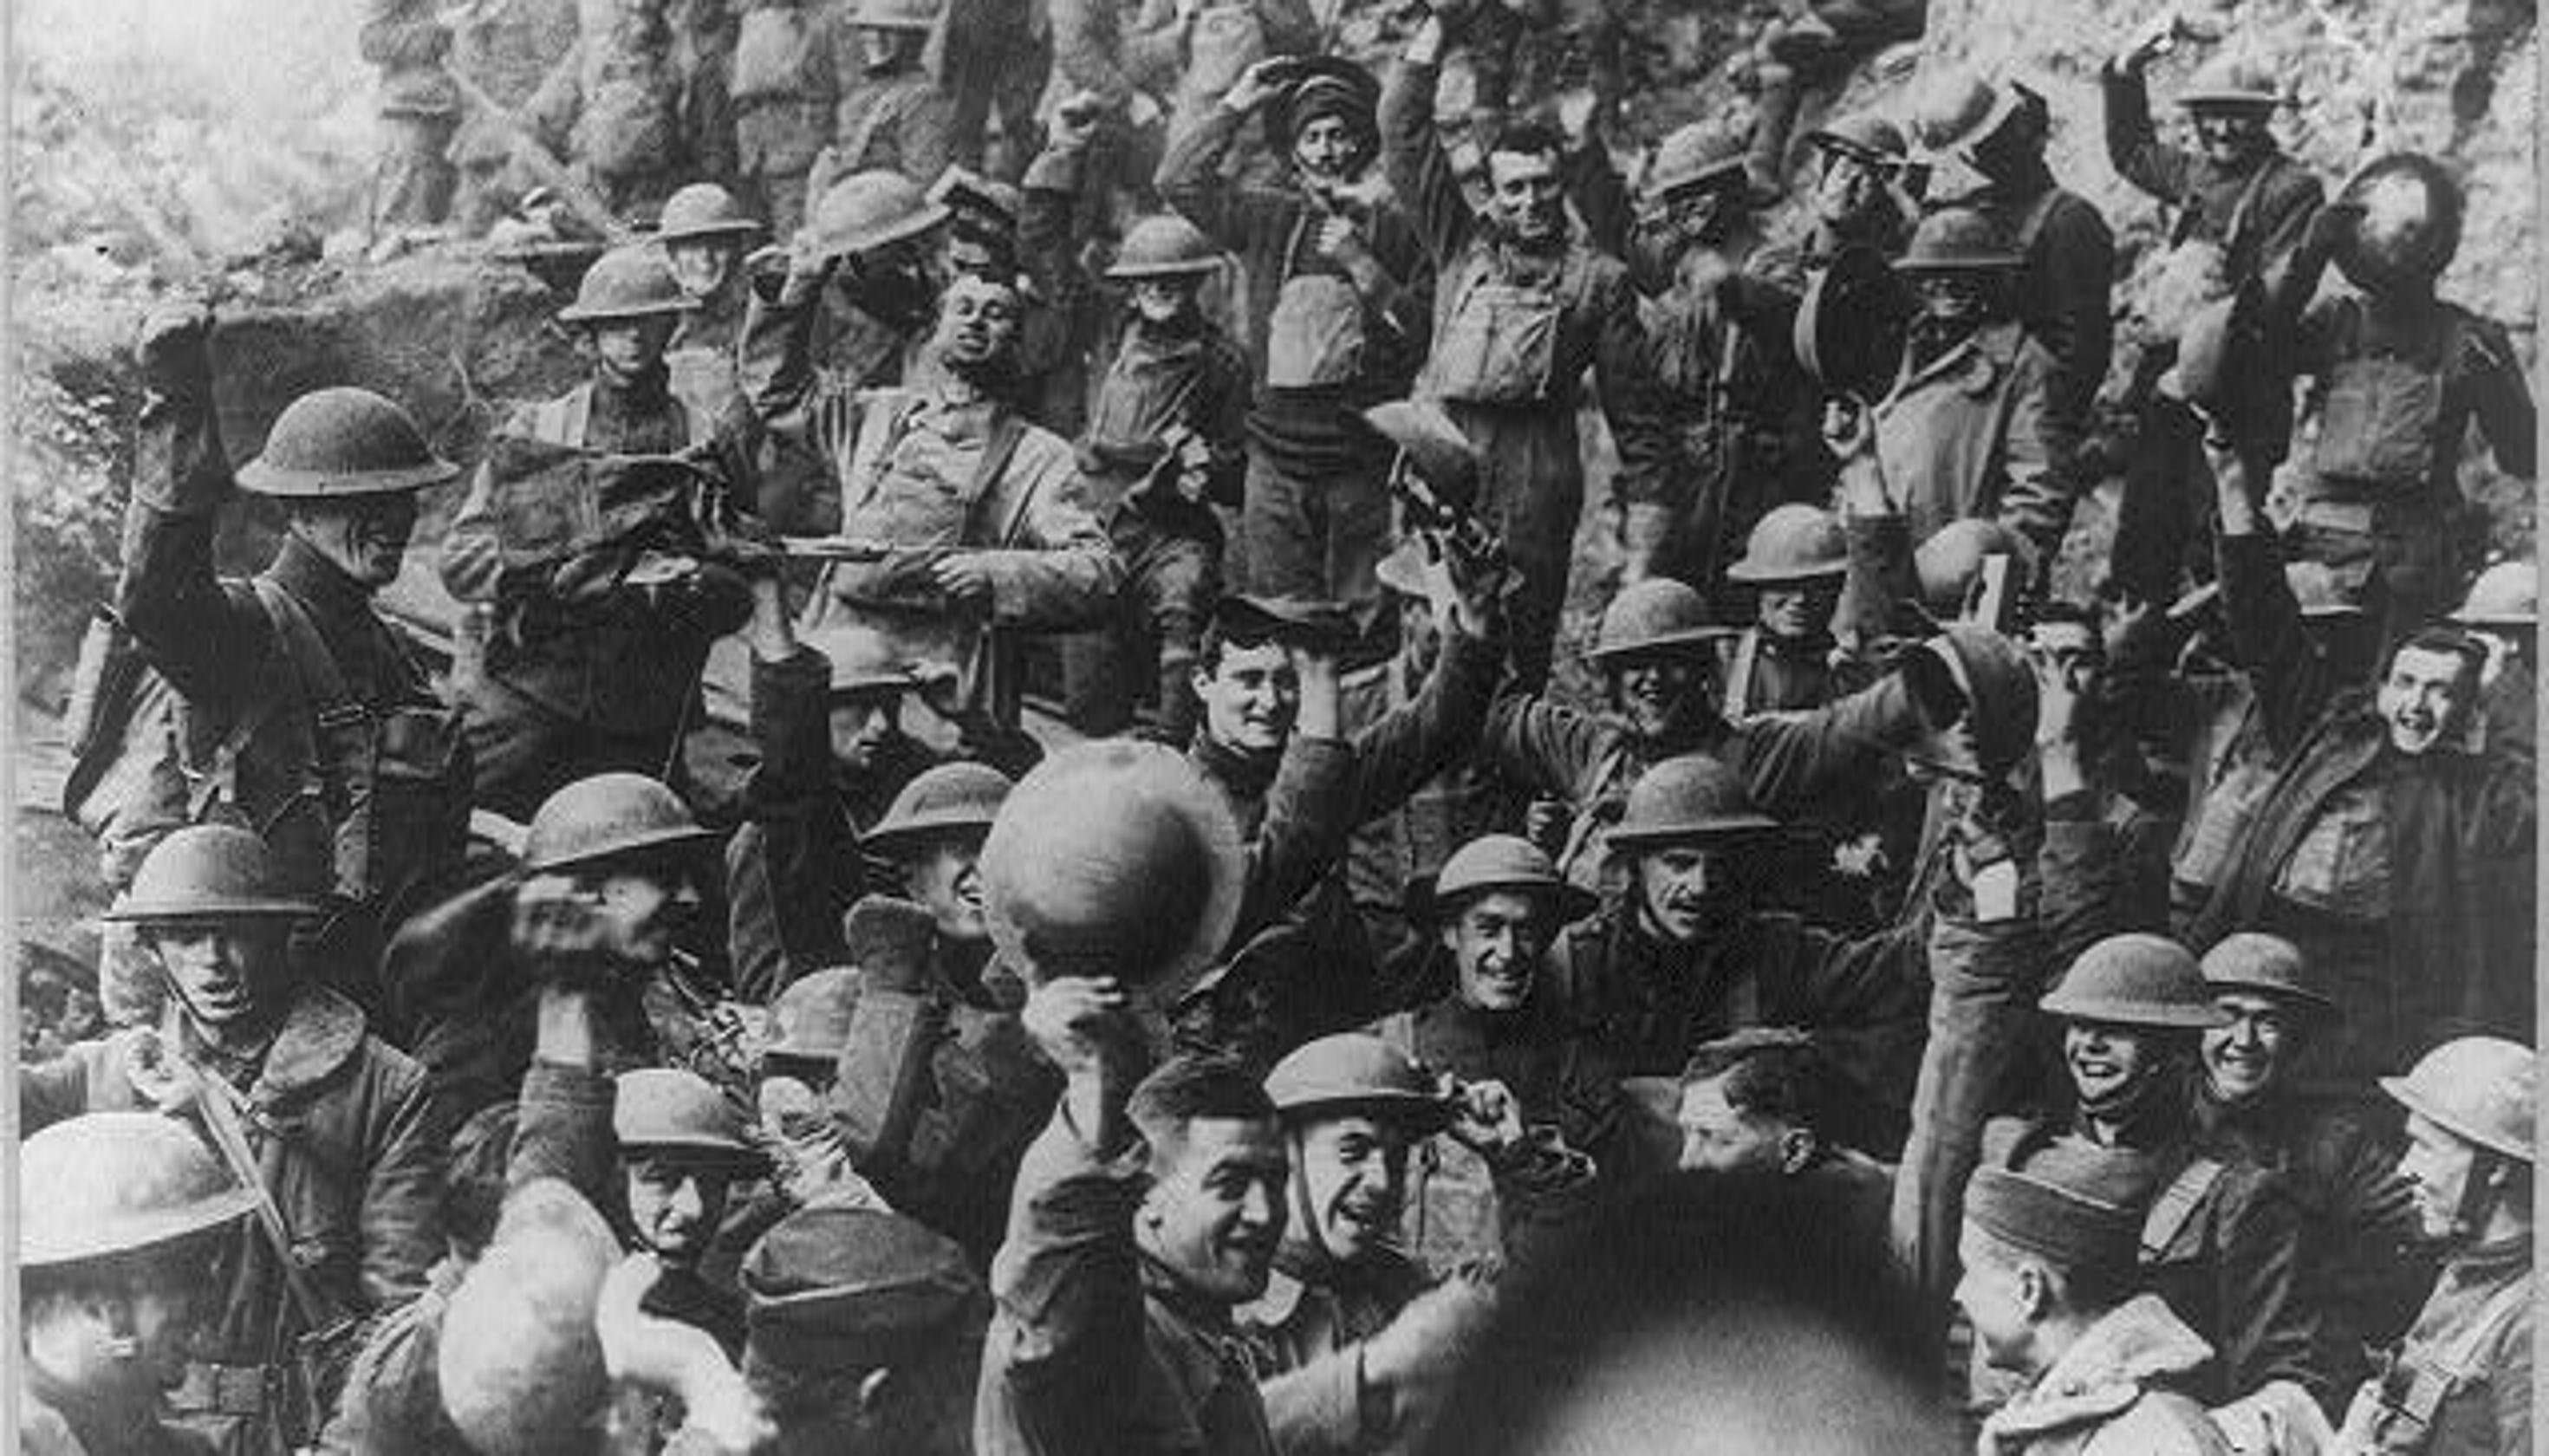 100th anniversary of Armistice Day